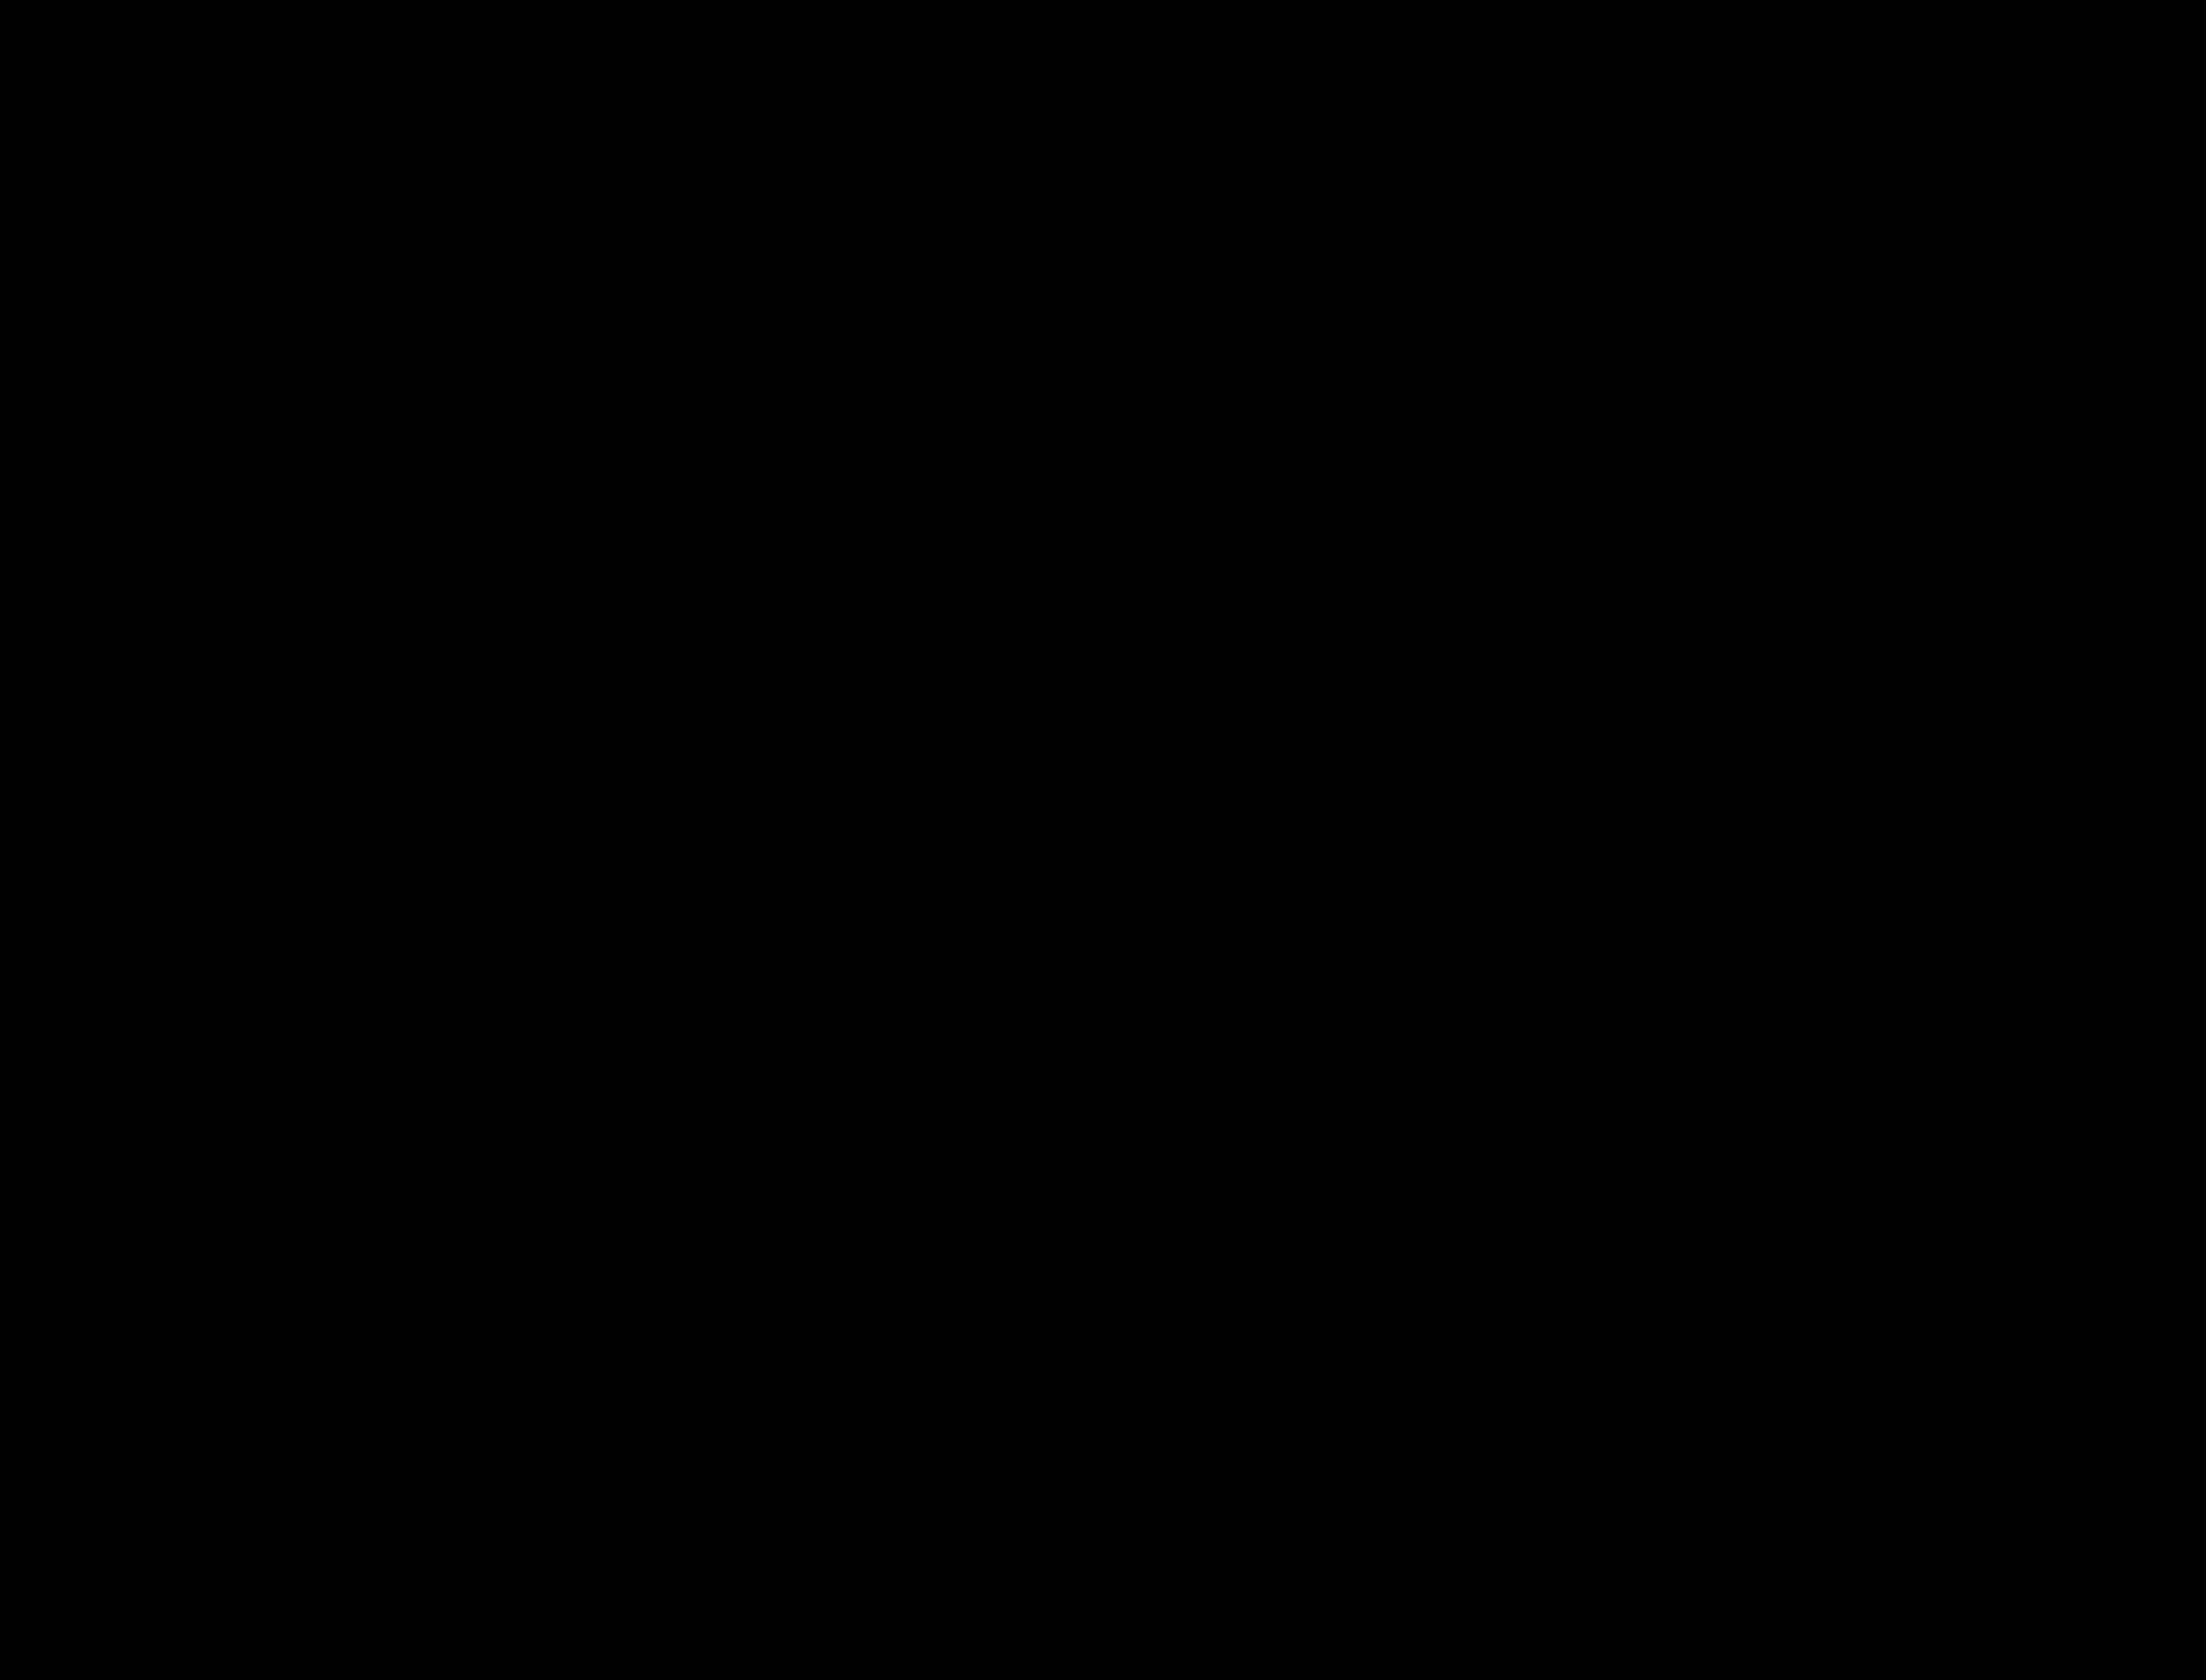 natura logo 5 1 - Natura Logo